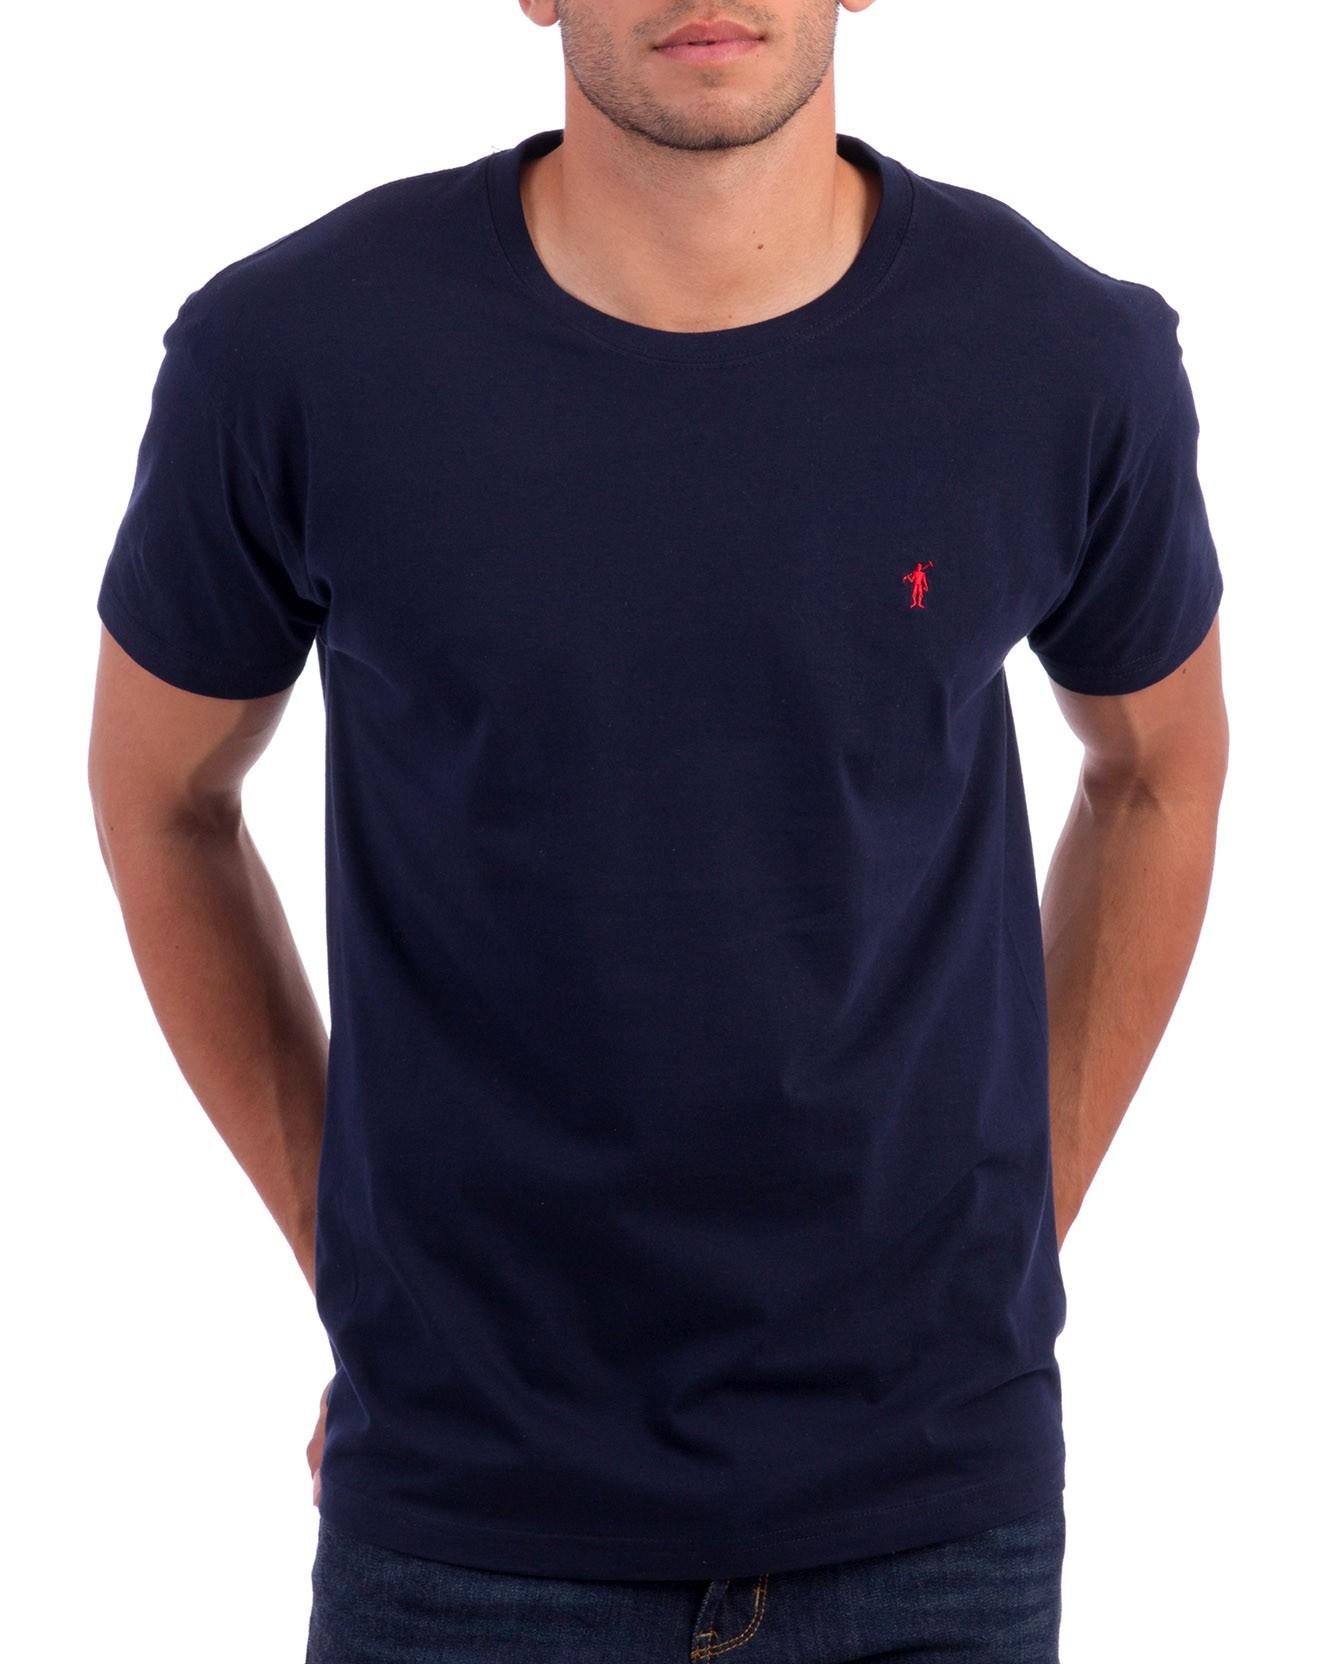 T-shirt Academy marine